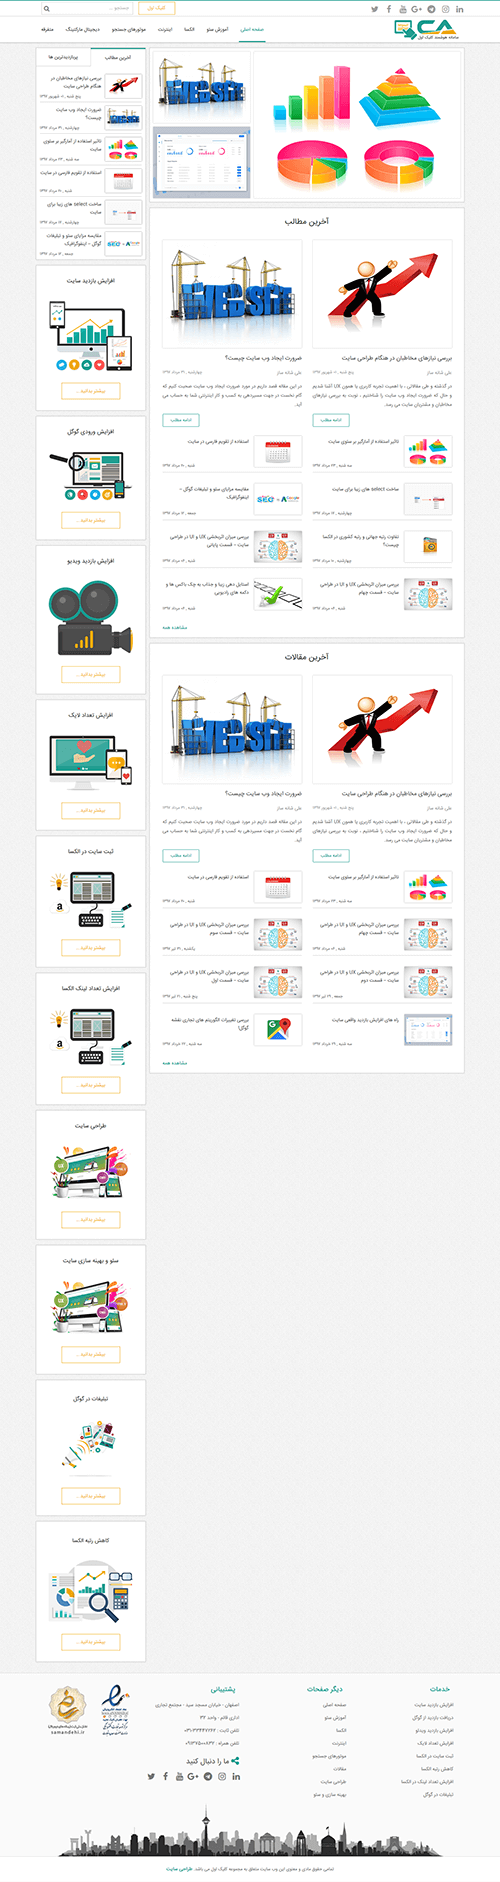 طراحی بلاگ کلیک اول